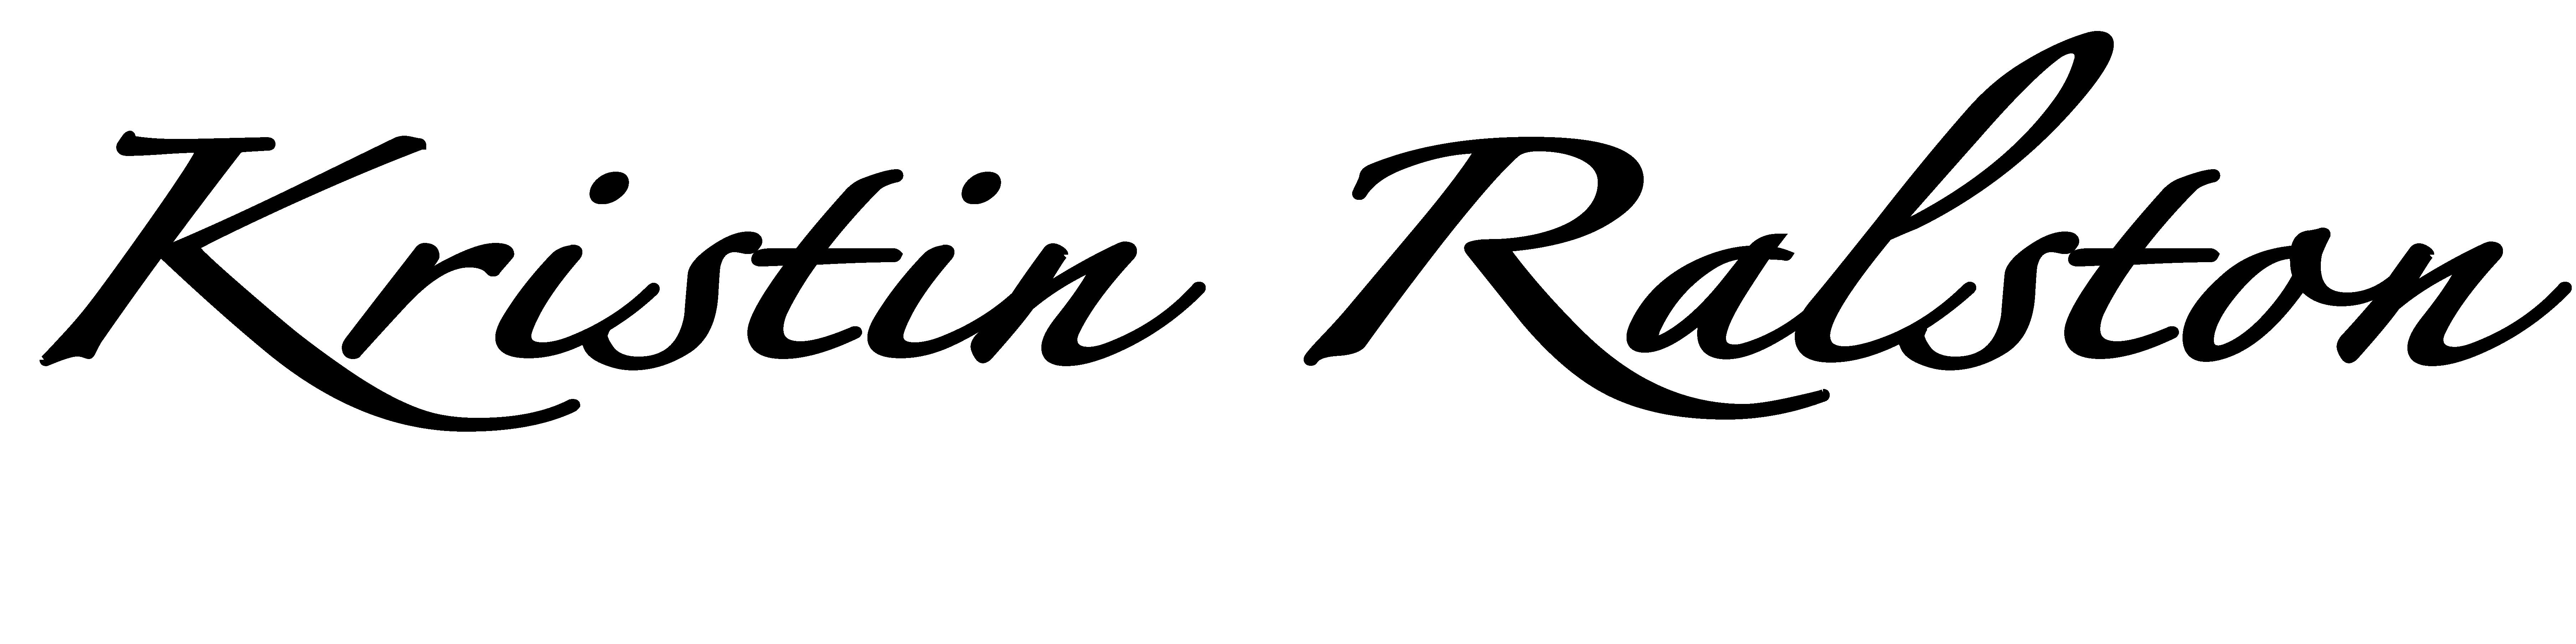 kristin ralston Signature